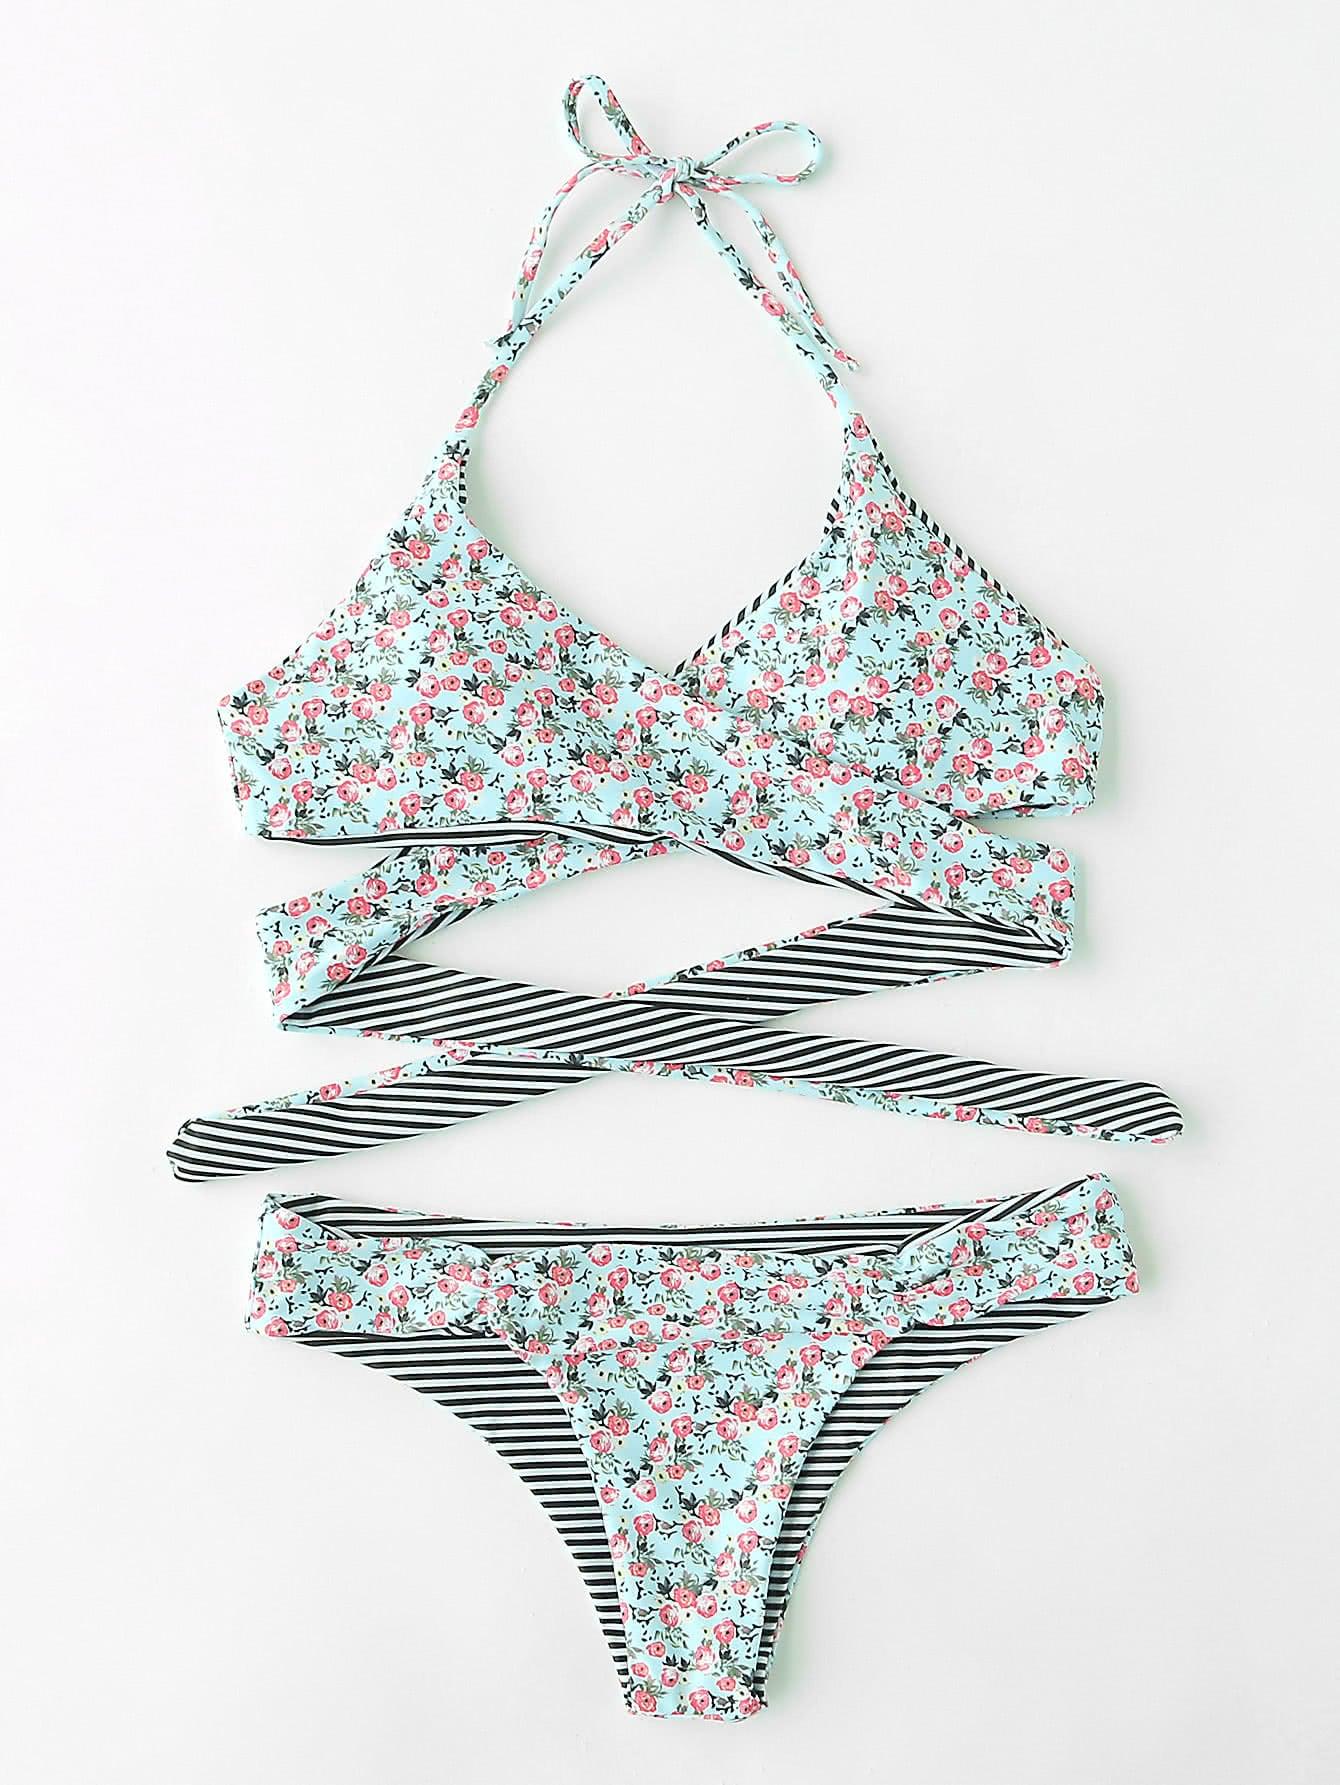 Calico Print Wrap Bikini Set swimwear170731307